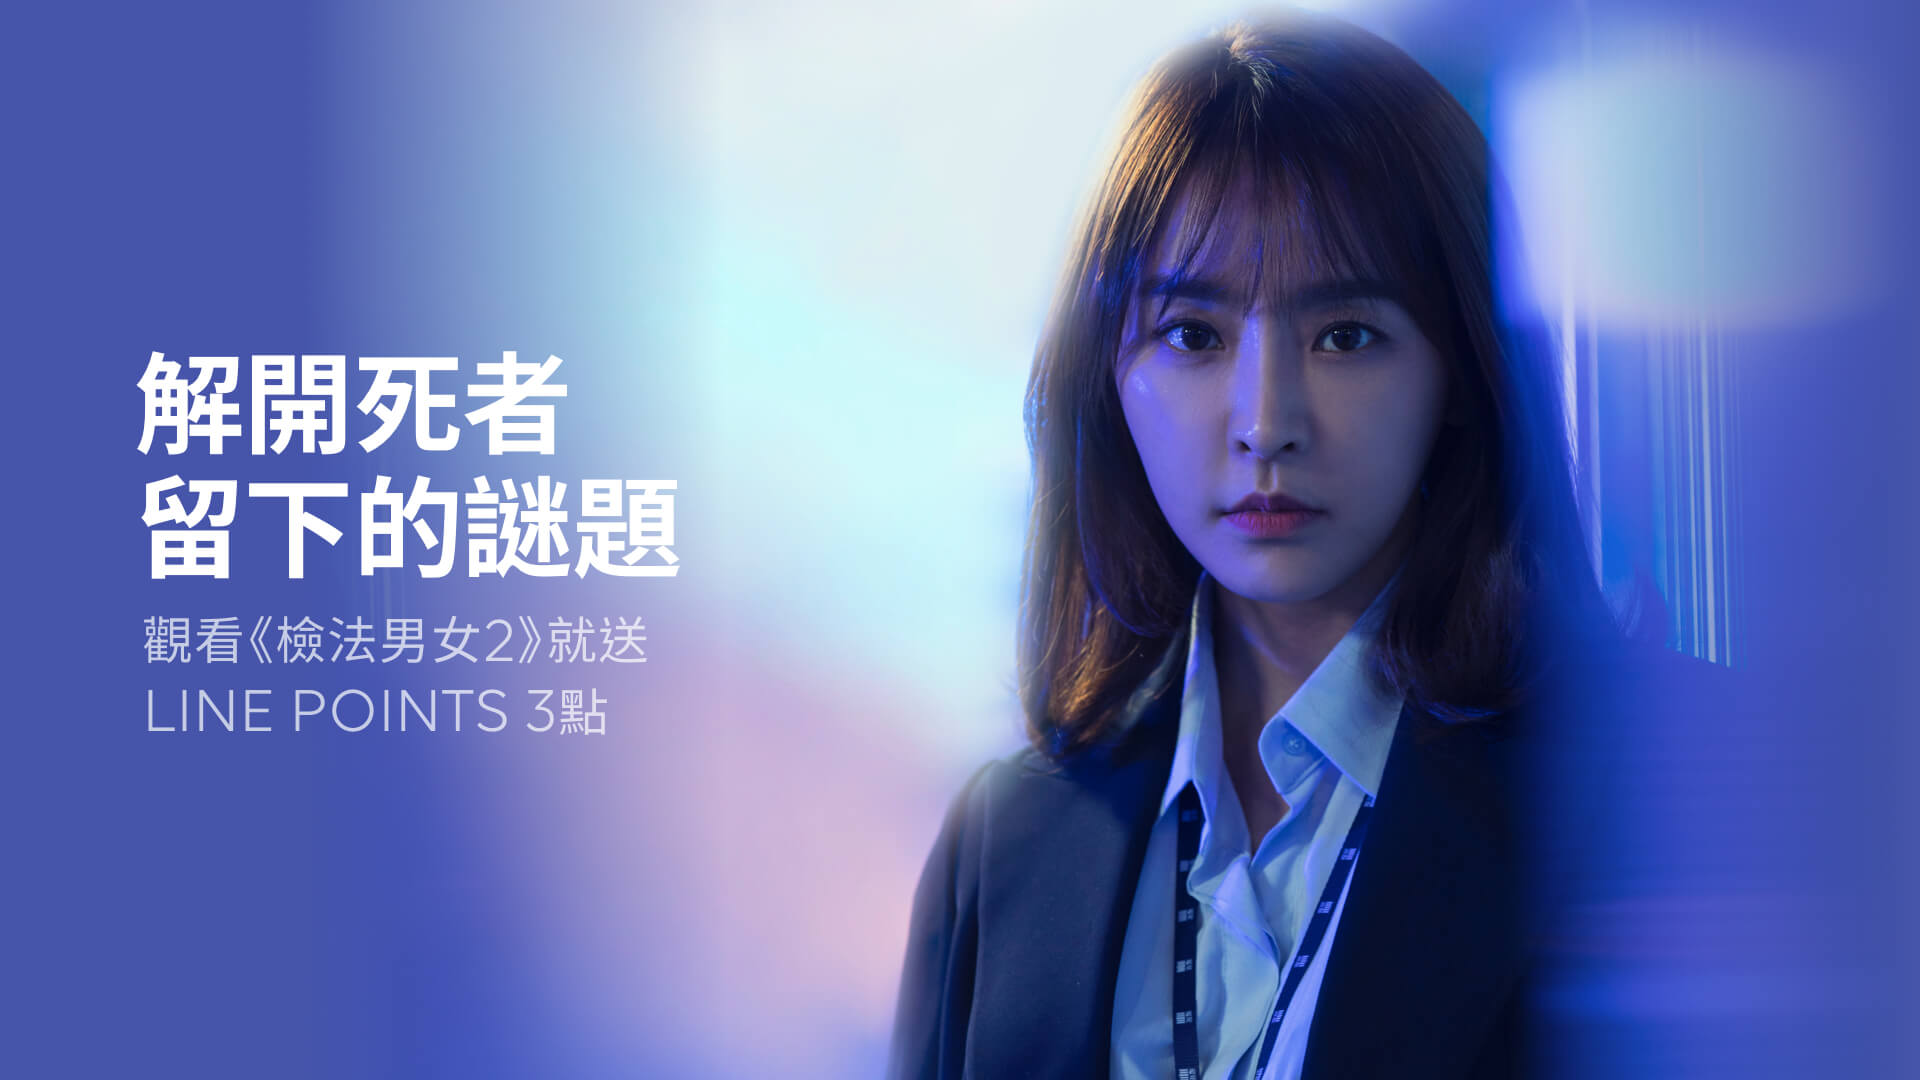 【LINE TV限時贈點活動】觀看《檢法男女2》就送LINE POINTS !